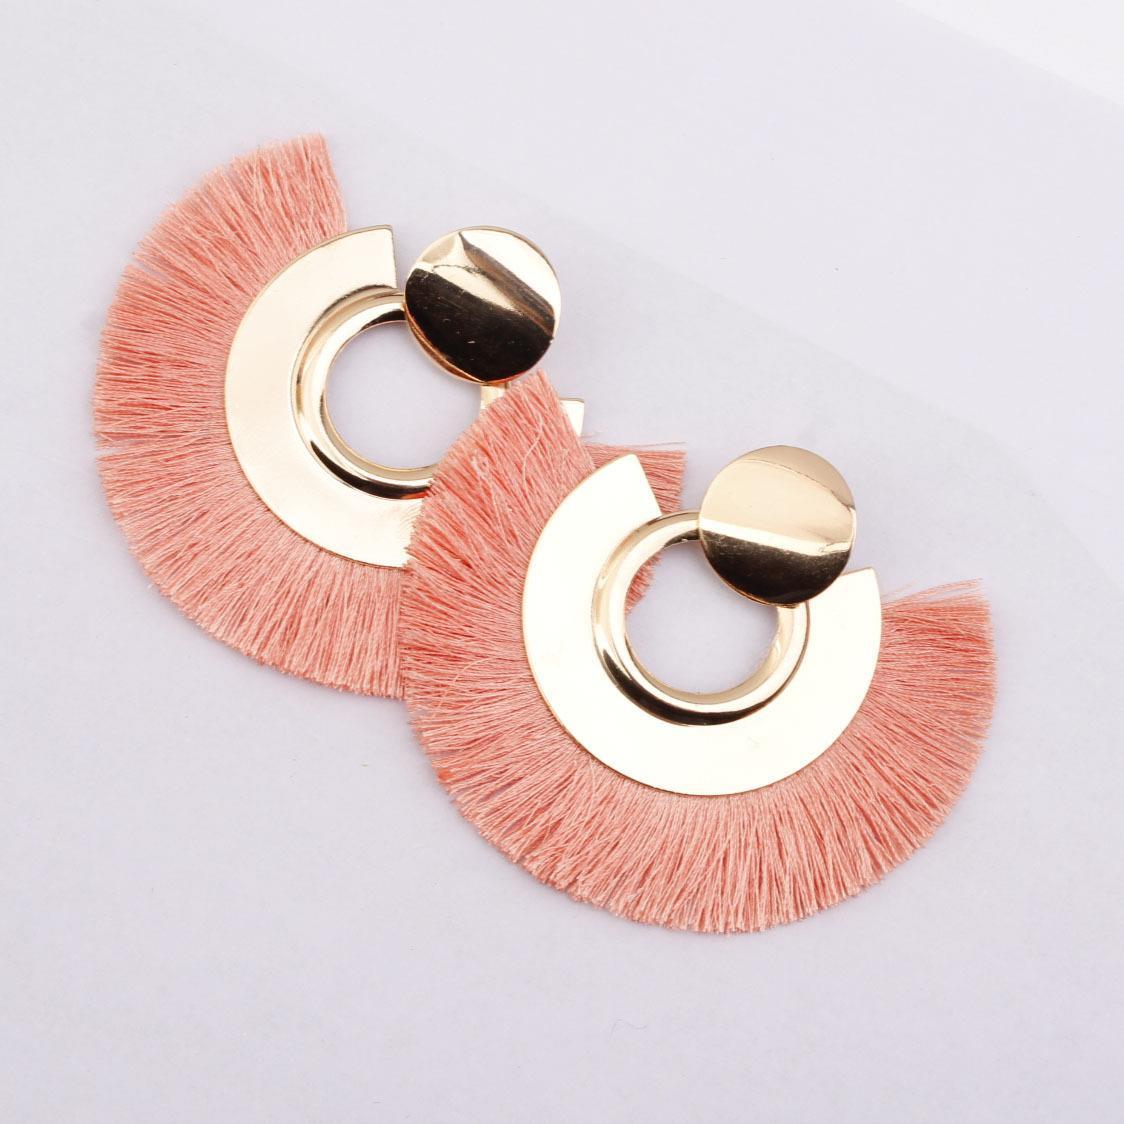 Women-Fashion-Rhinestone-Long-Tassel-Dangle-Earrings-Fringe-Drop-Jewelry-Gift-UK thumbnail 174